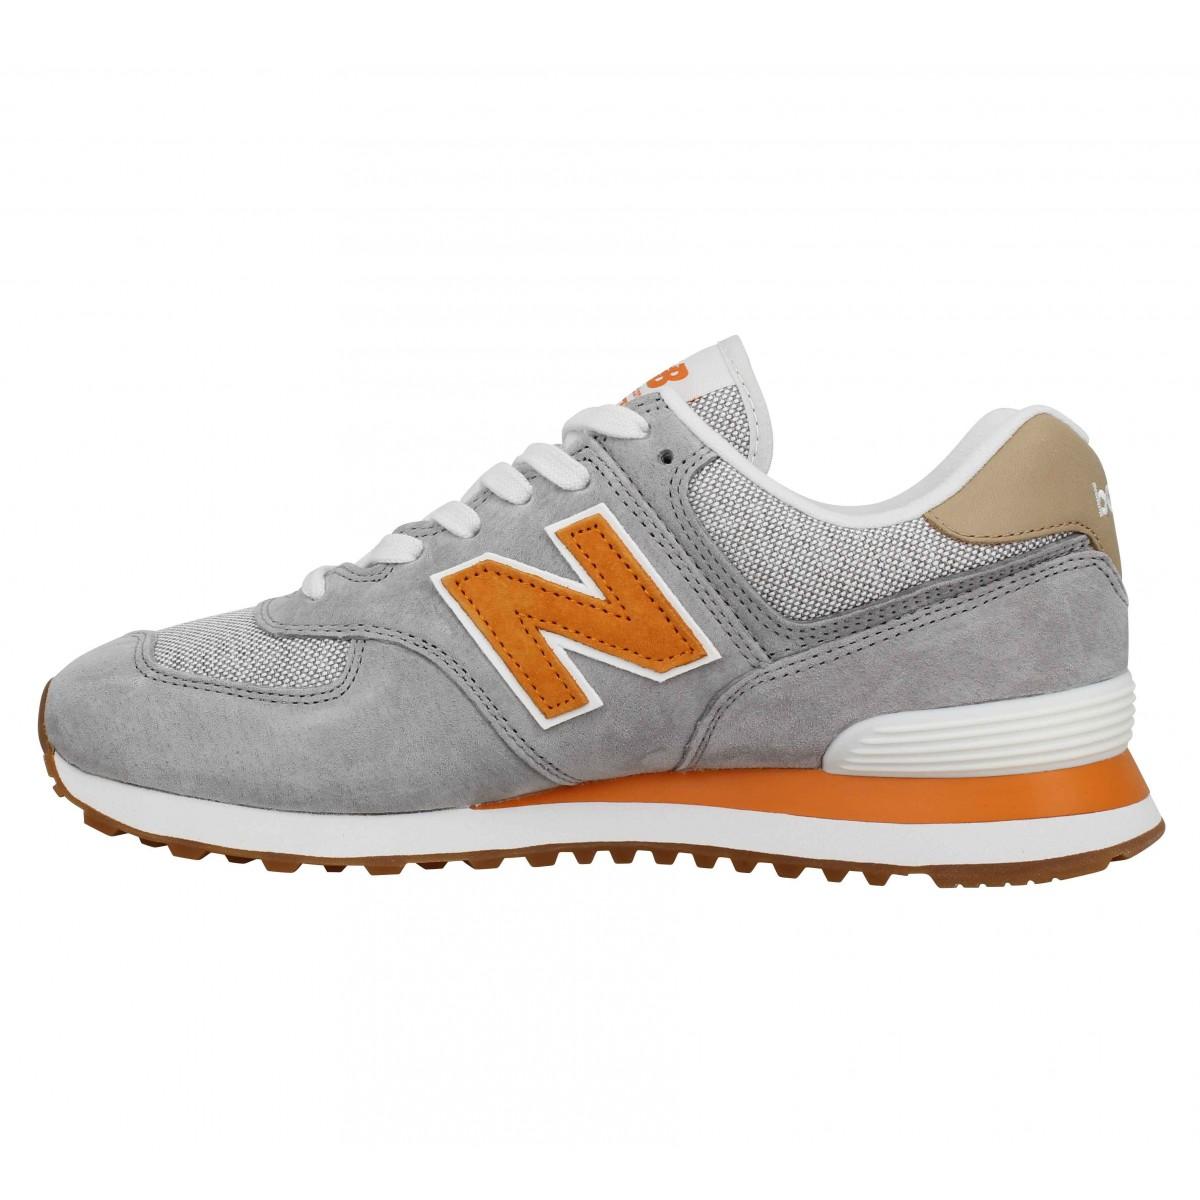 new balance homme gris orange